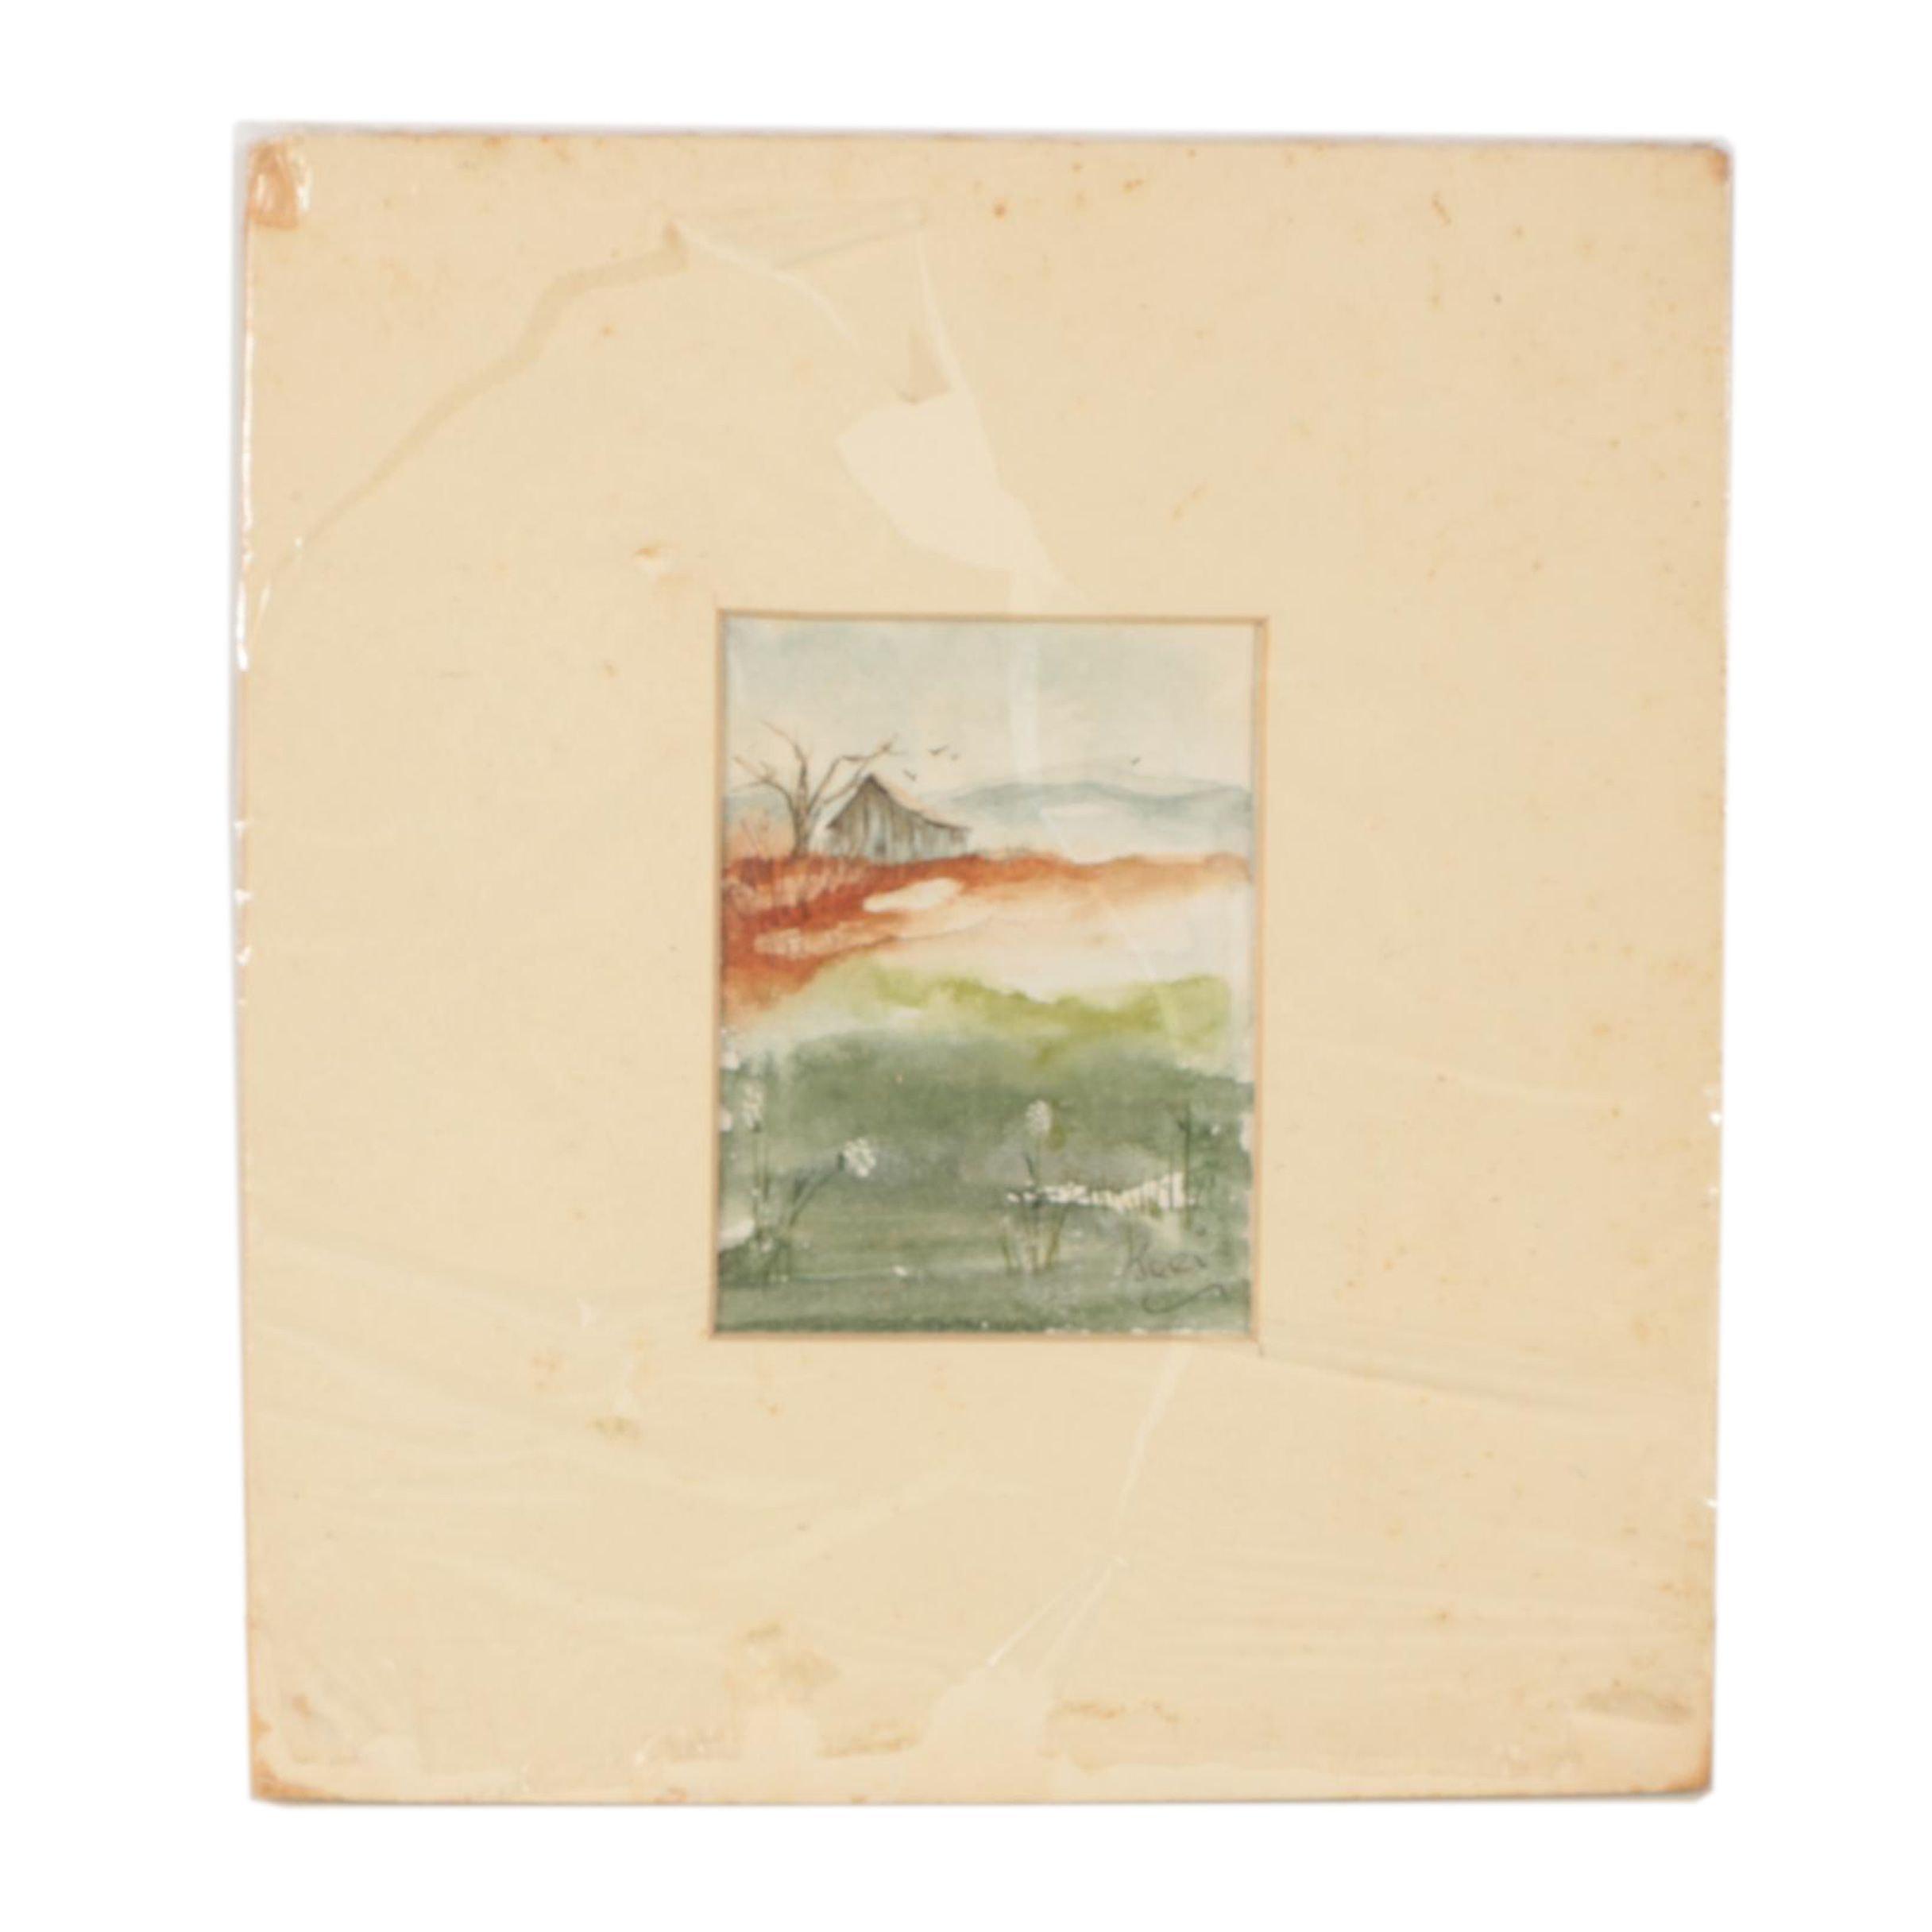 Jeri Watercolor Painting of a Landscape